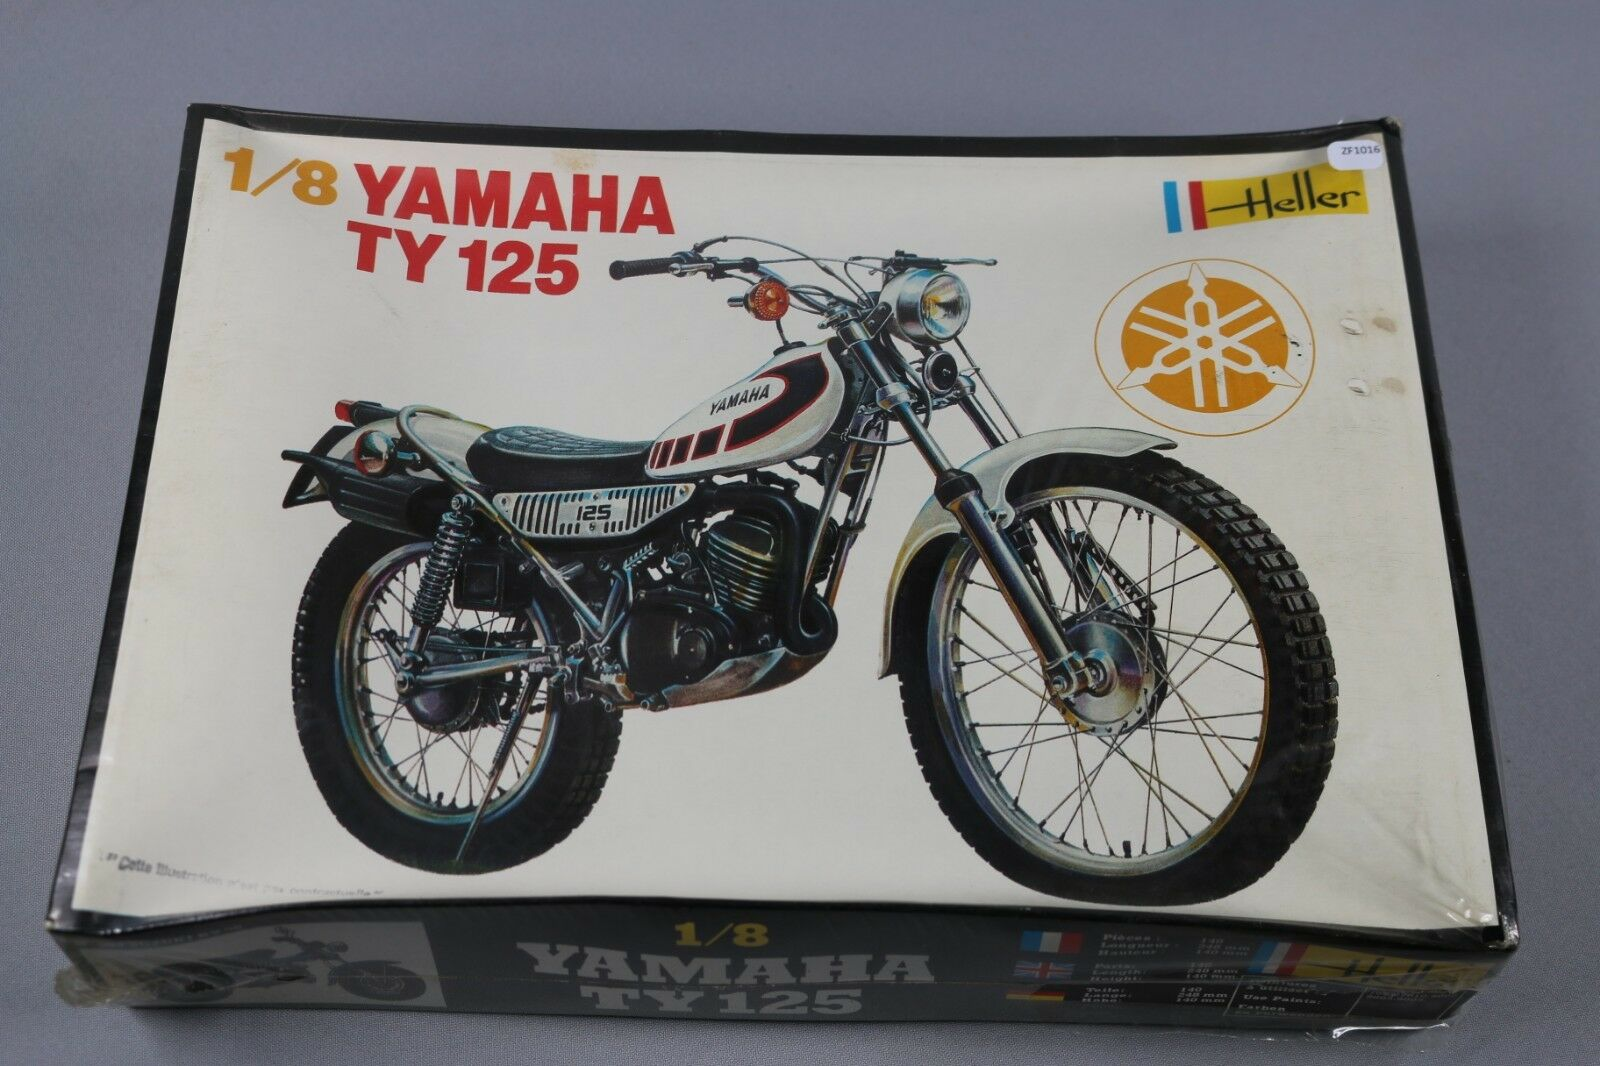 Zf1016 Heller 1 8 modellololo Moto 902 Yamaha Ty 125 Trials 248x140mm 140 Parti